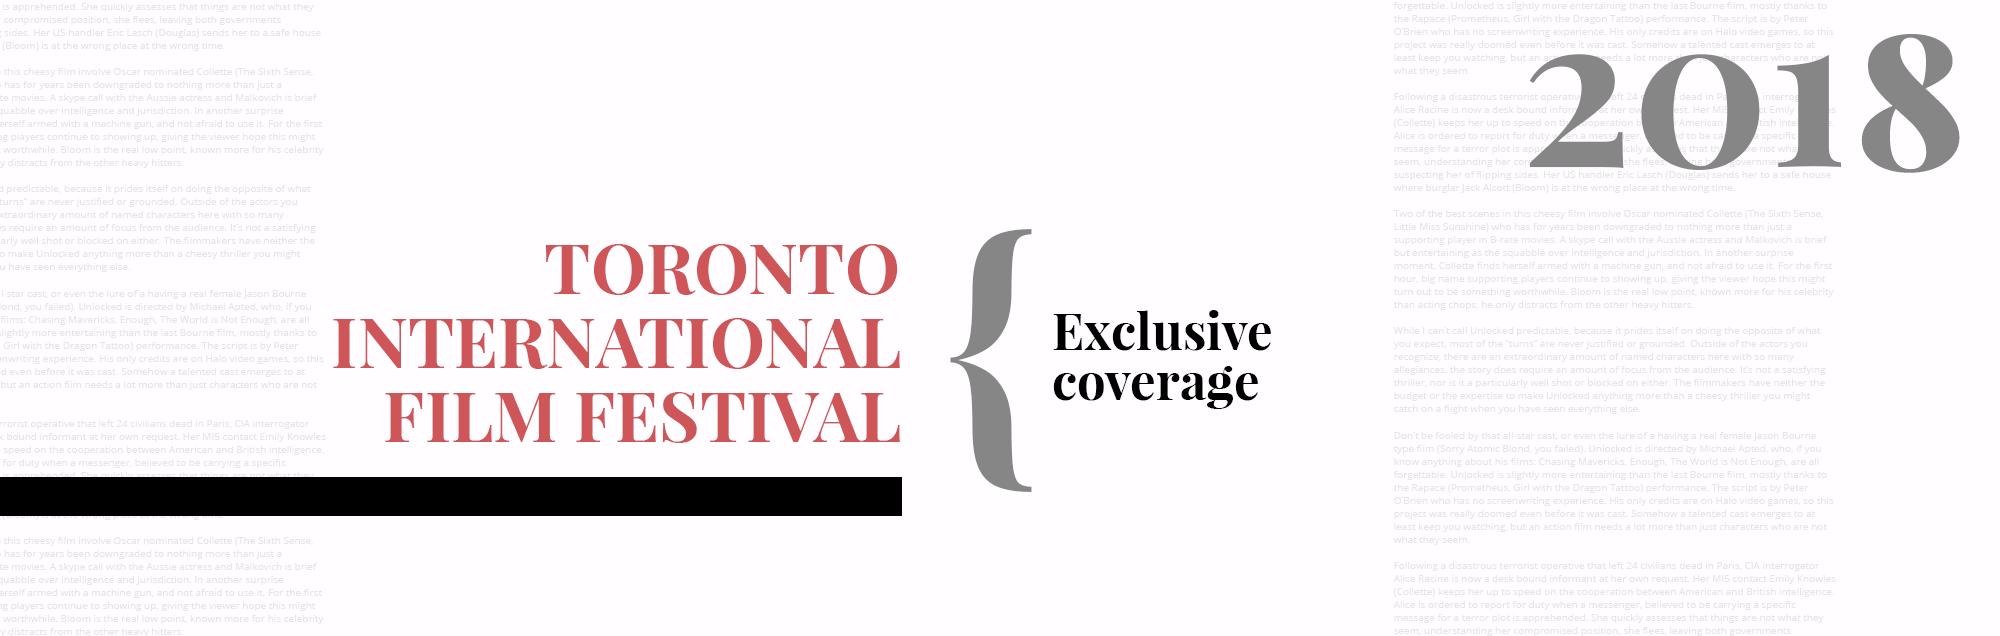 Toronto International Film Festival 2018